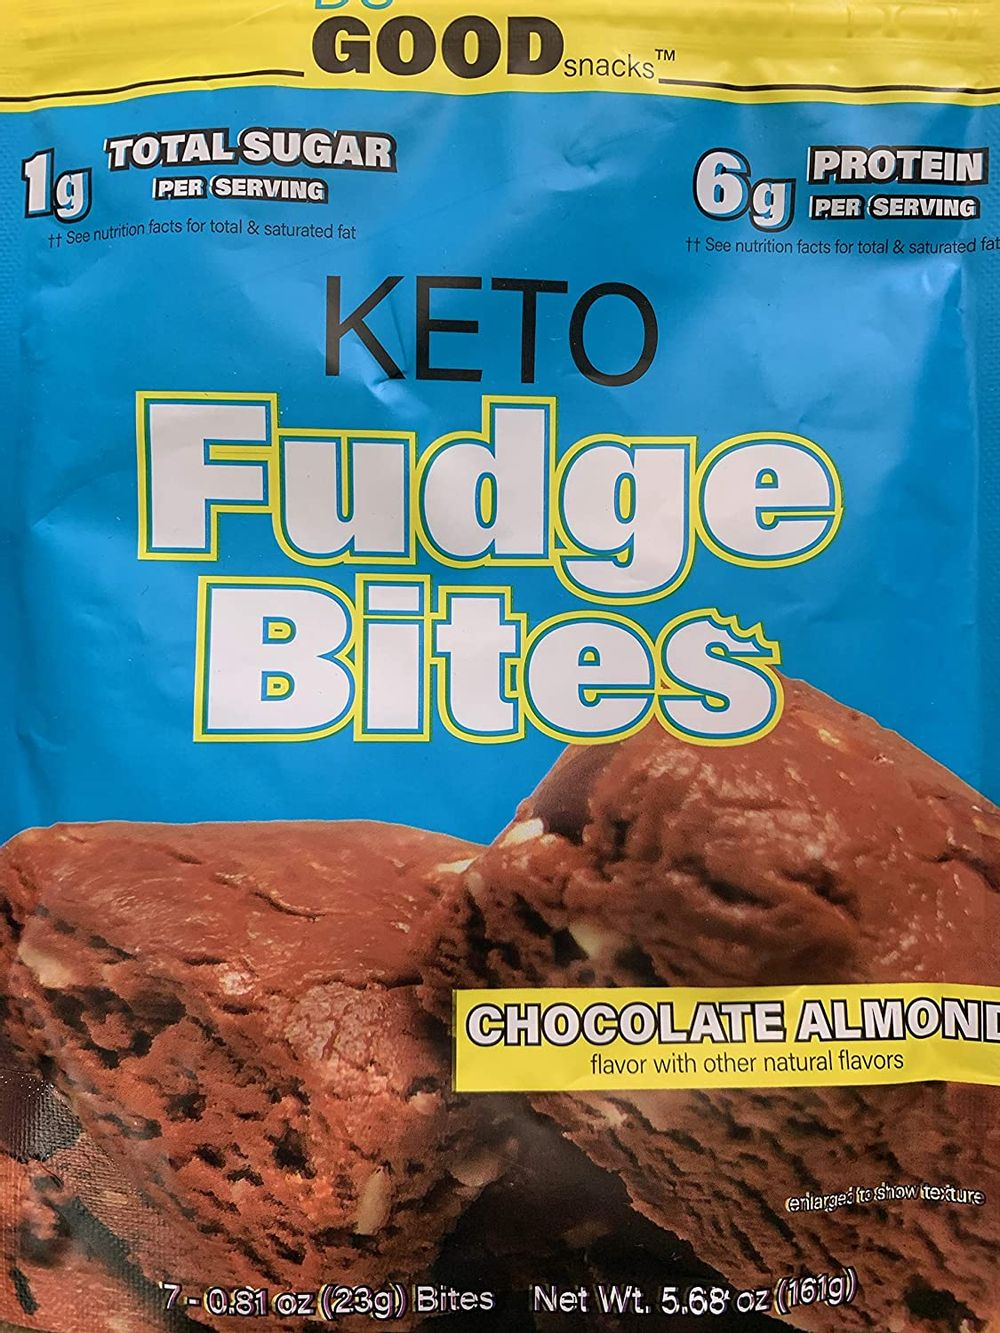 Keto Fudge Bites - Delicious Low-Carb to-go Chocolate Snacks | Non GMO, Gluten Free, Paleo Togo Snack Made with Grass-Fed Whey Protein | Ketogenic Diet Friendly Treats (7 Bites) - Bonus EBOOK